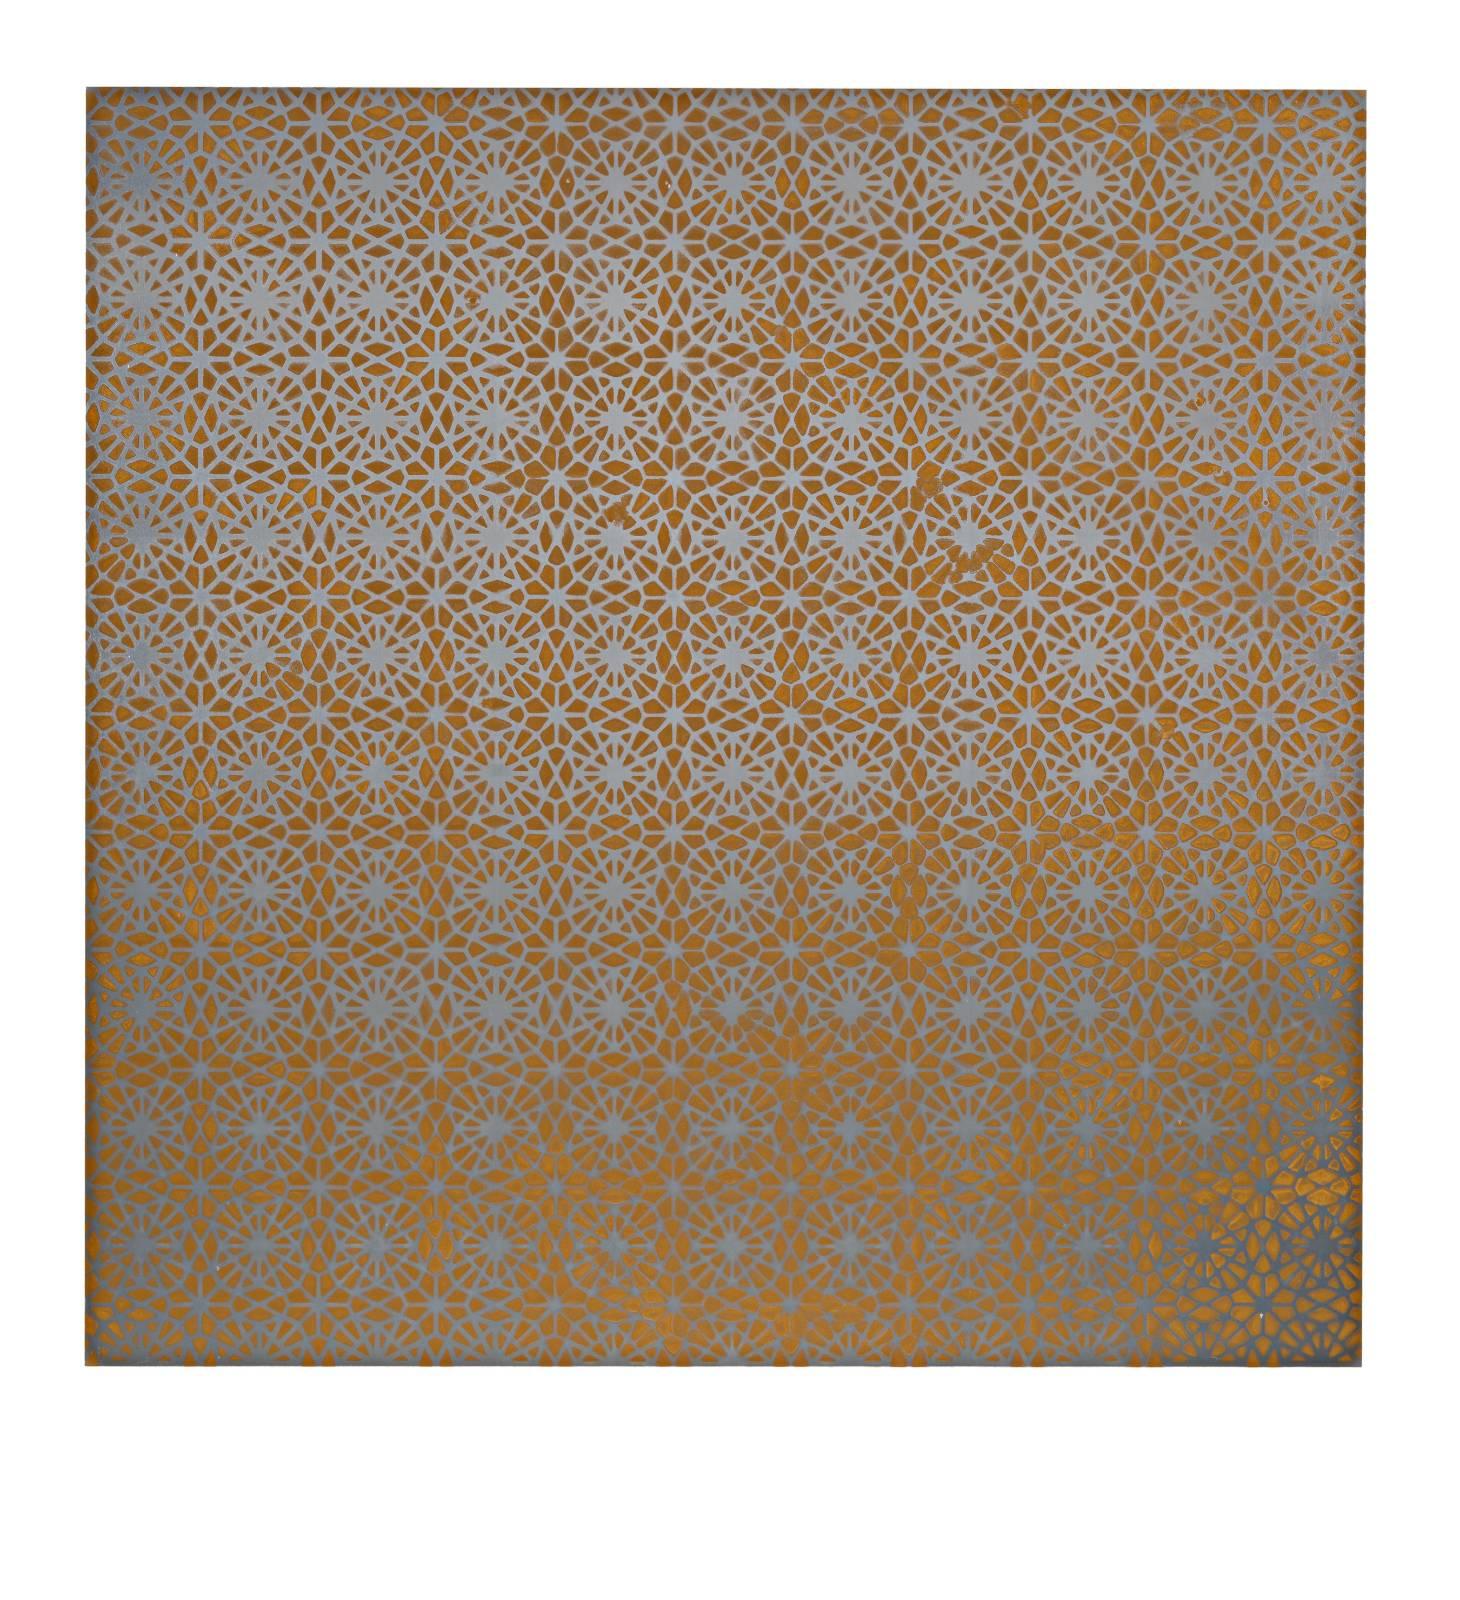 "STAIN : 55°36'40.9""N 13°05'46.6""E, 2016, spraypaint on aluminium, 81,3 x 81,3 cm"